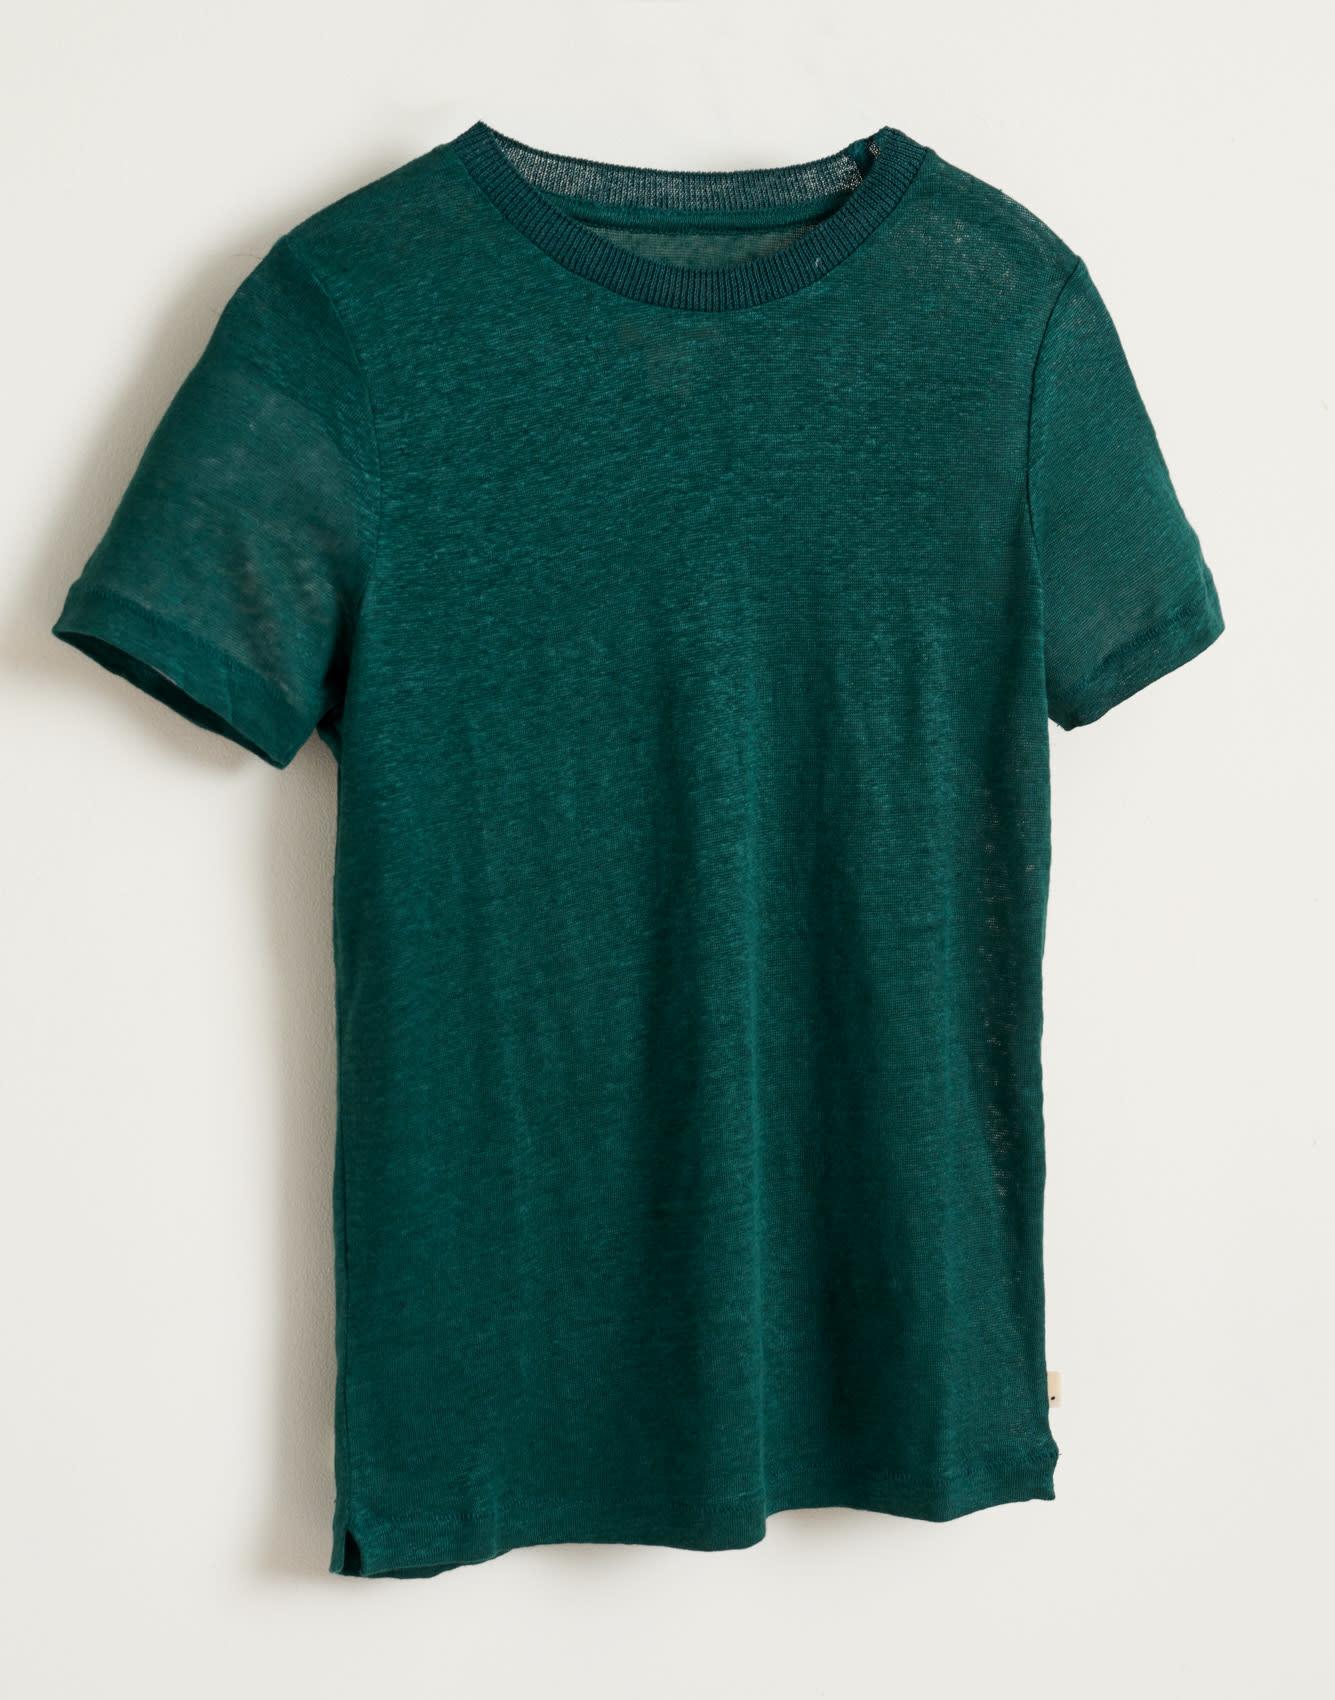 T-shirt pacific-3